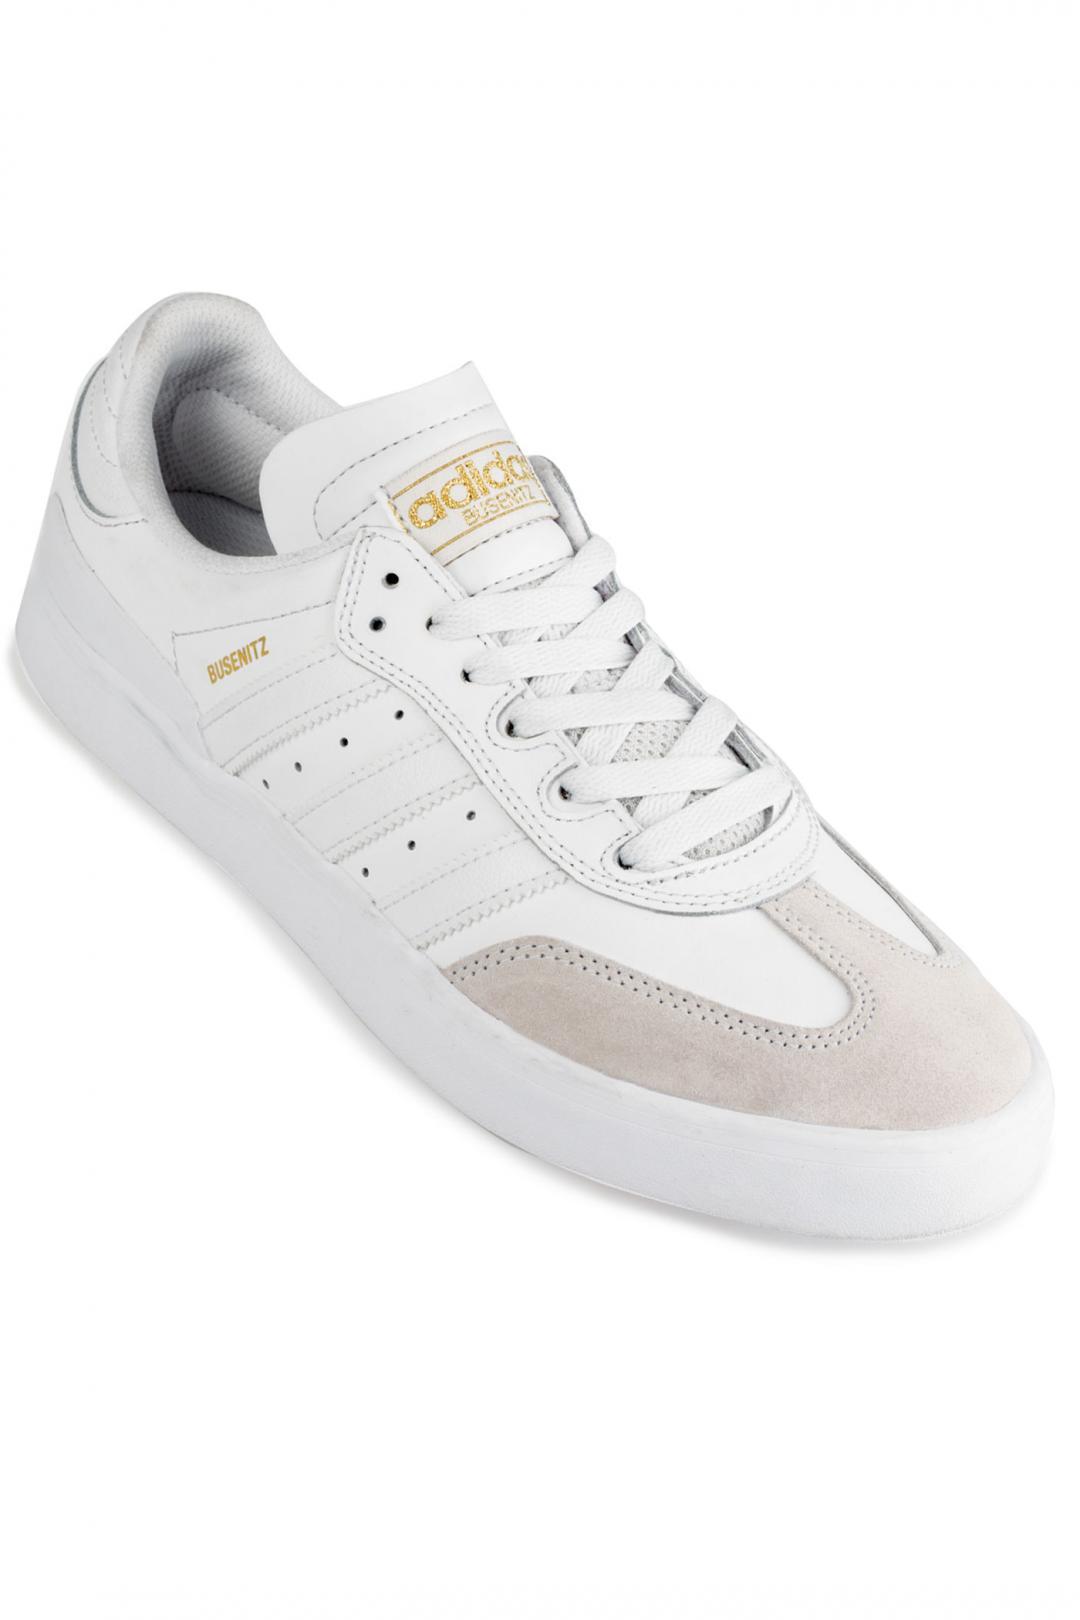 Uomo adidas Skateboarding Busenitz Vulc RX crystal white white | Scarpe da skate